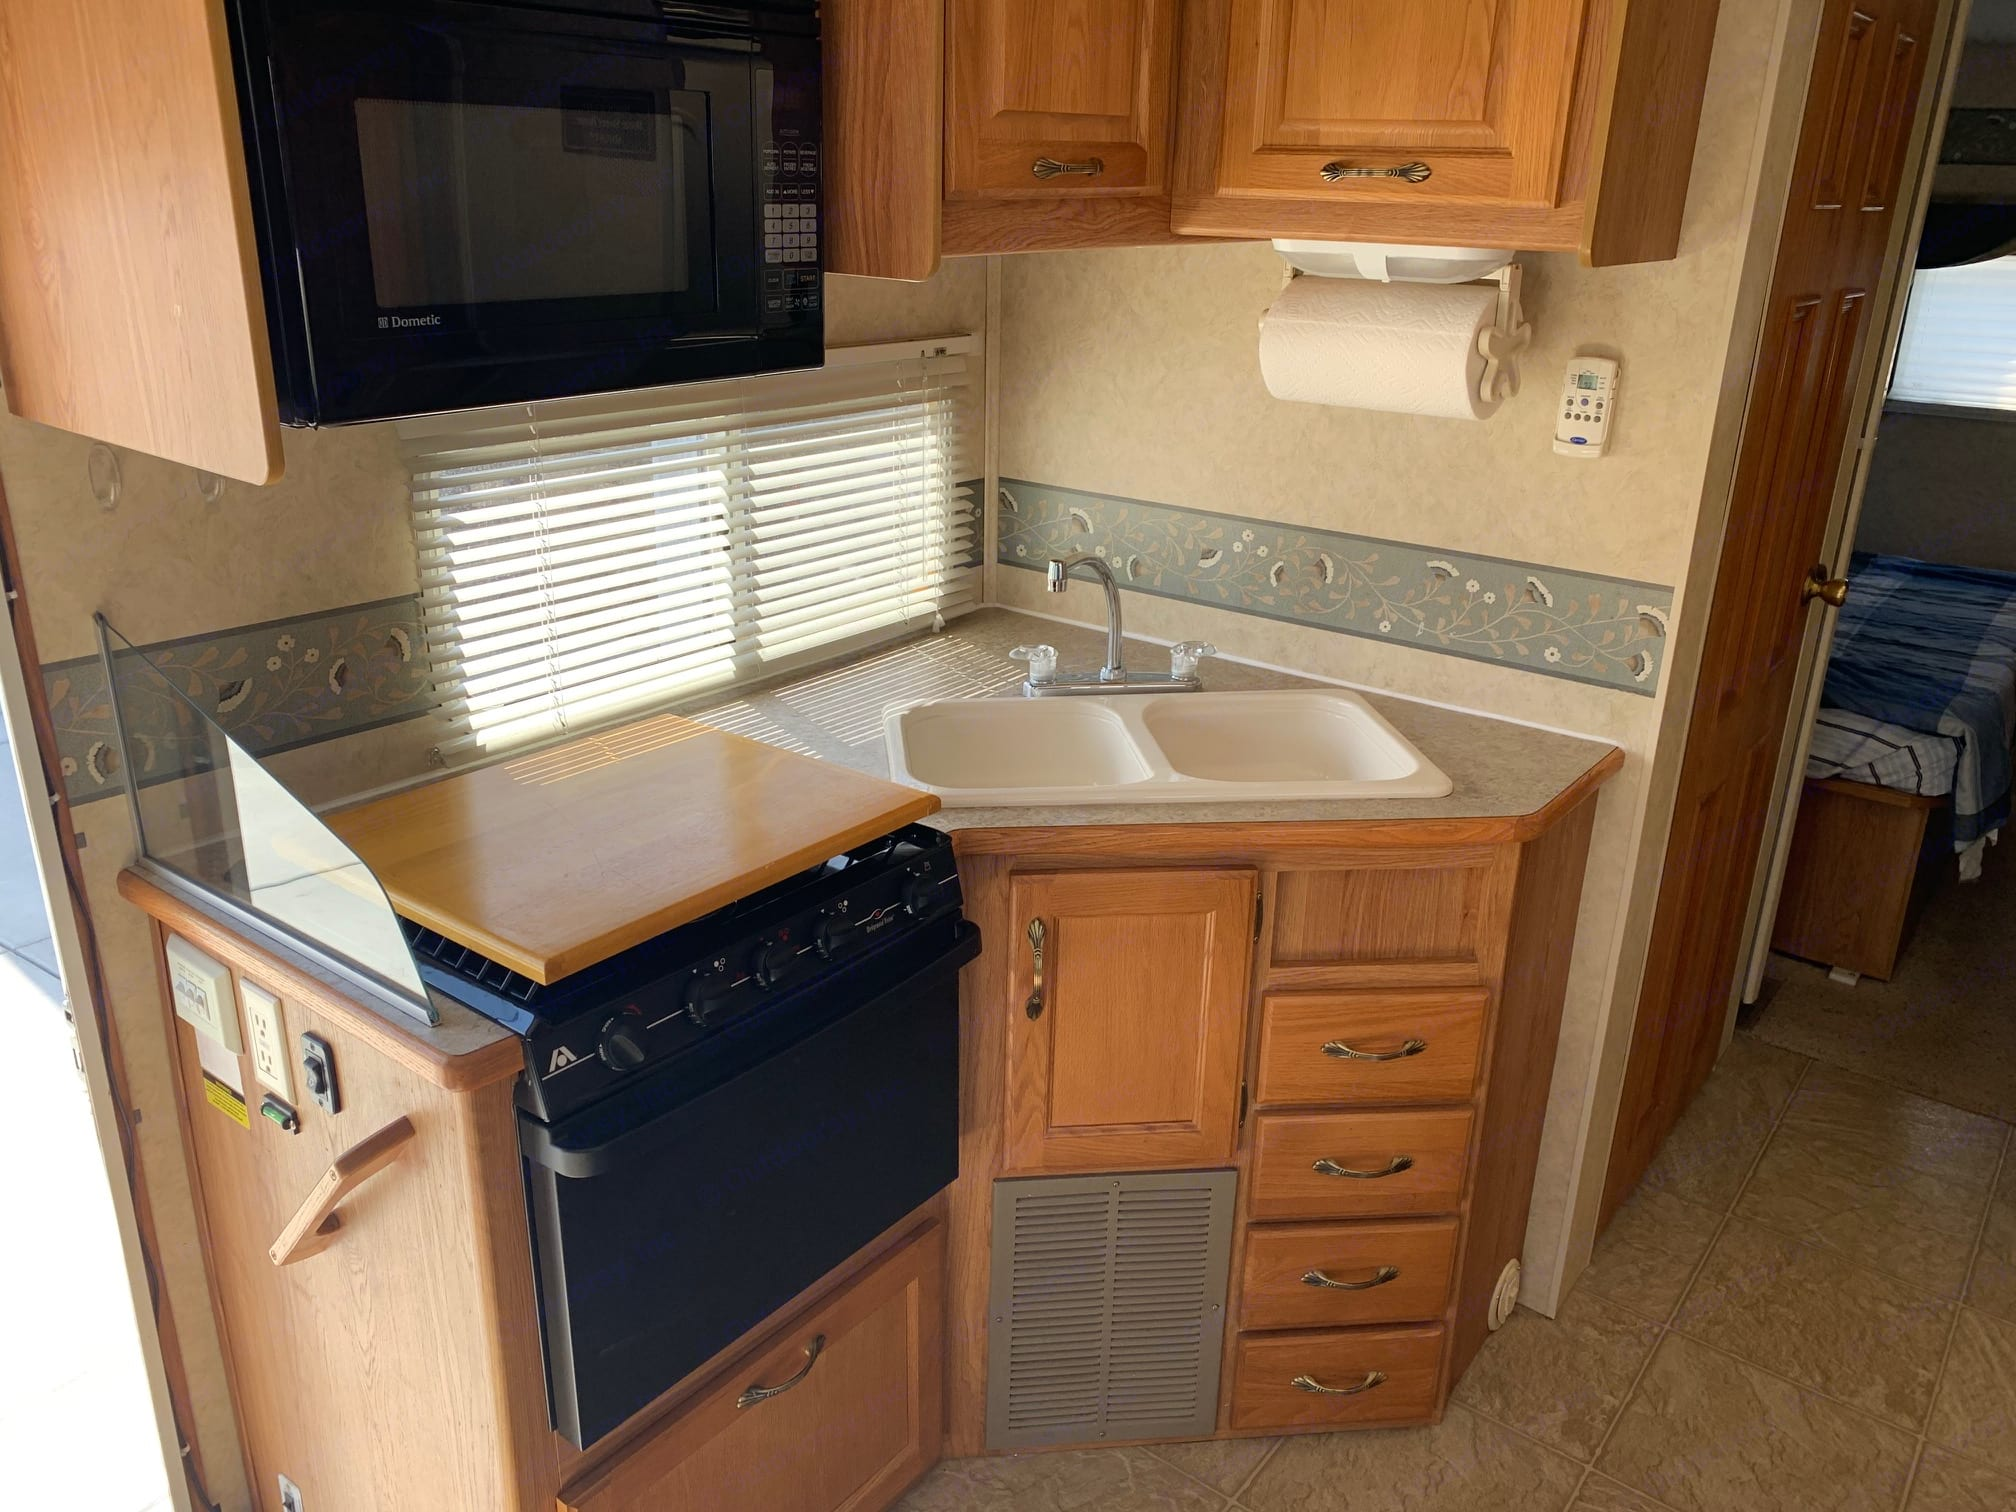 Full oven and double sink. Jayco Greyhawk 2005